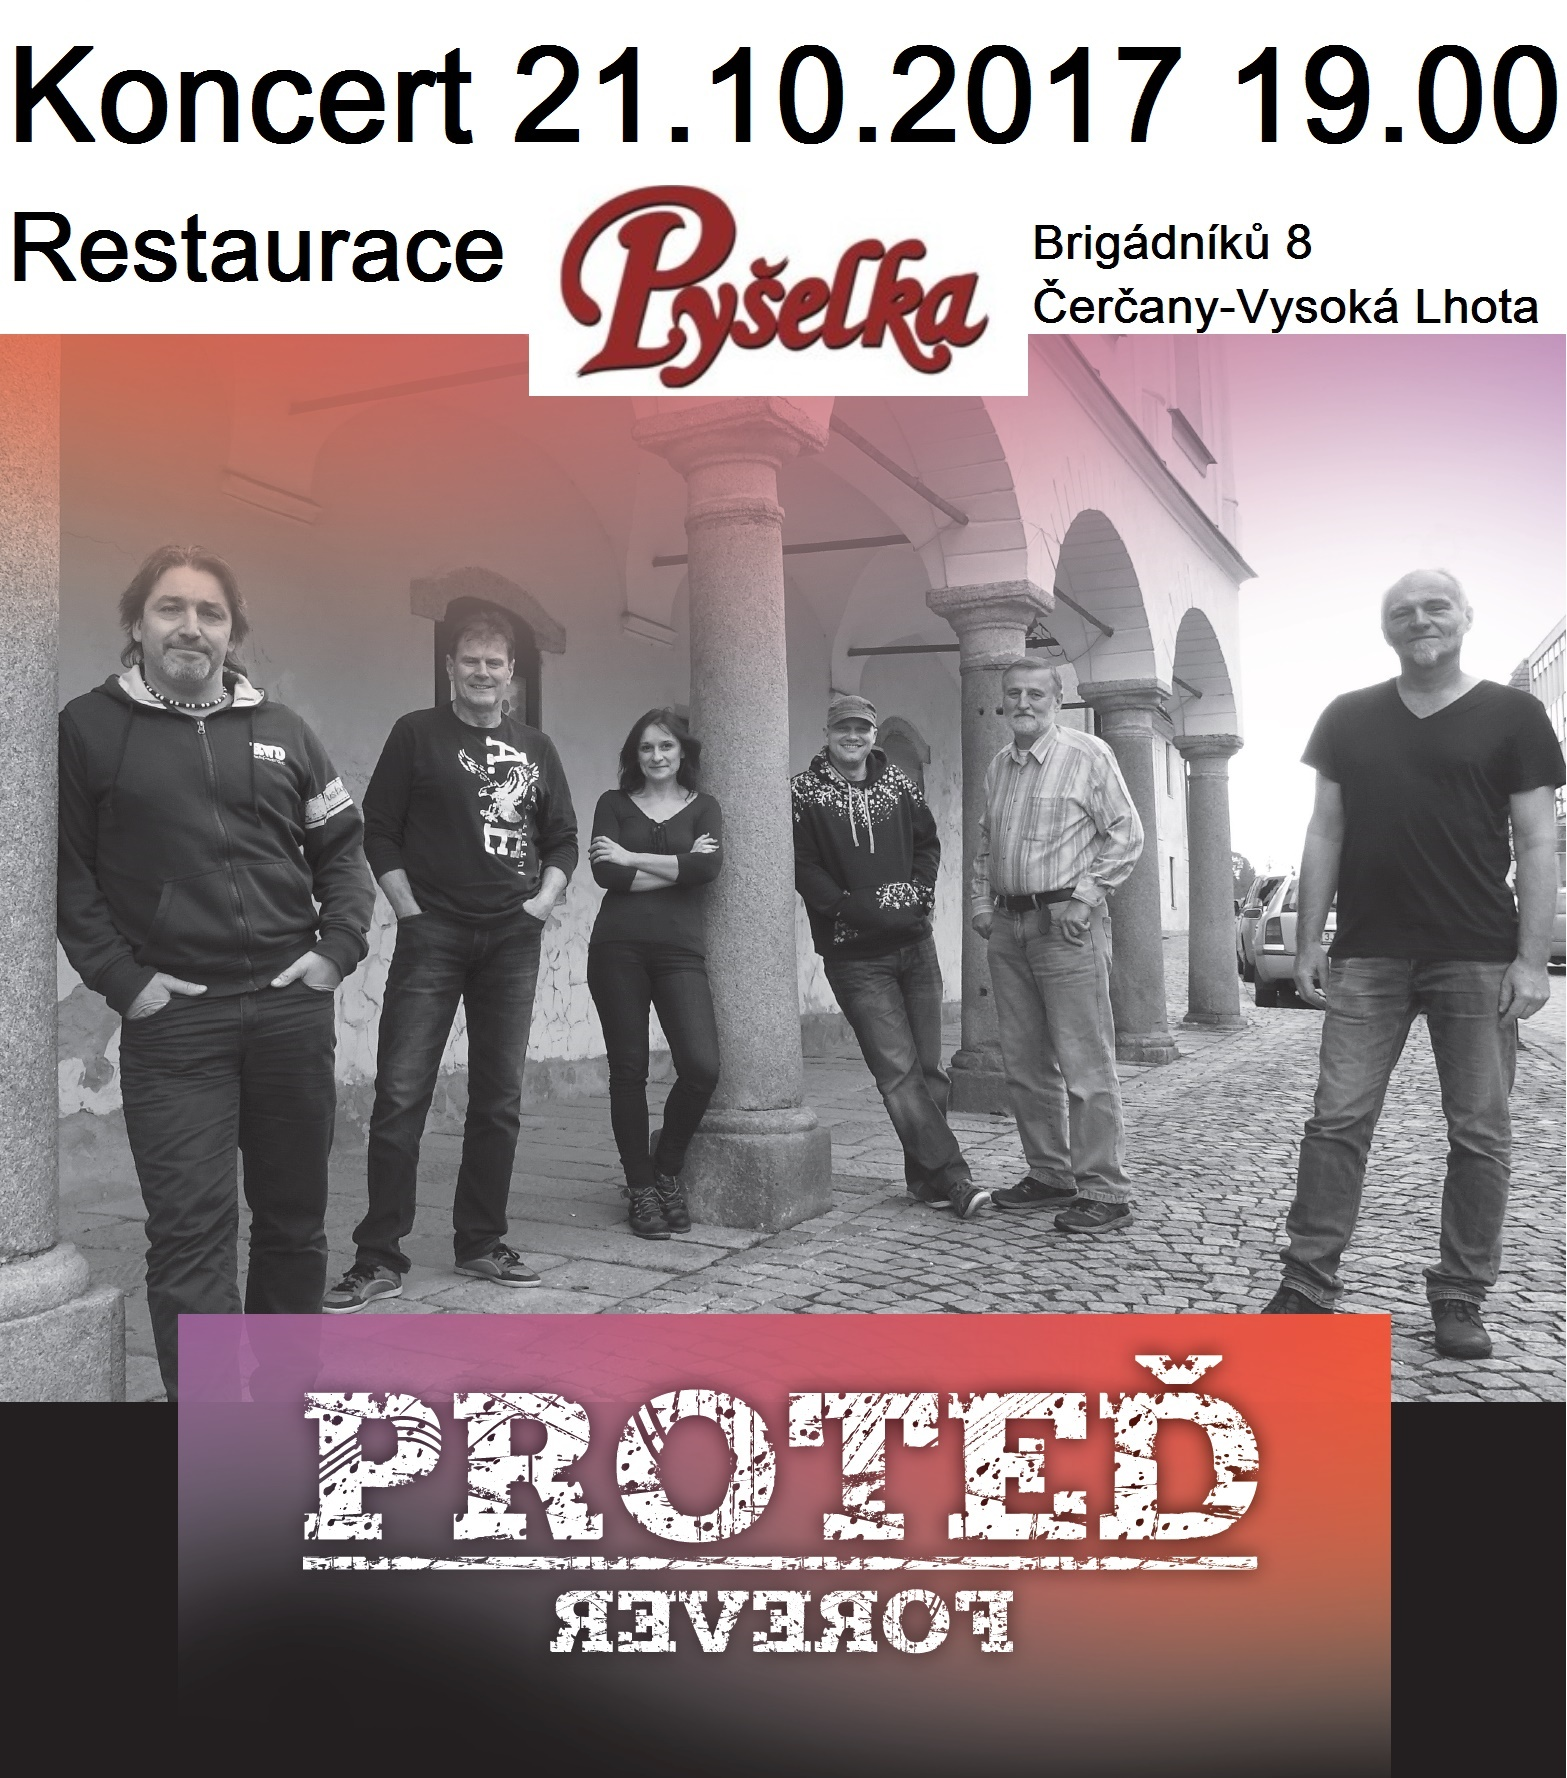 Skupina Proteď - koncert Pyšelka 21.10.2017